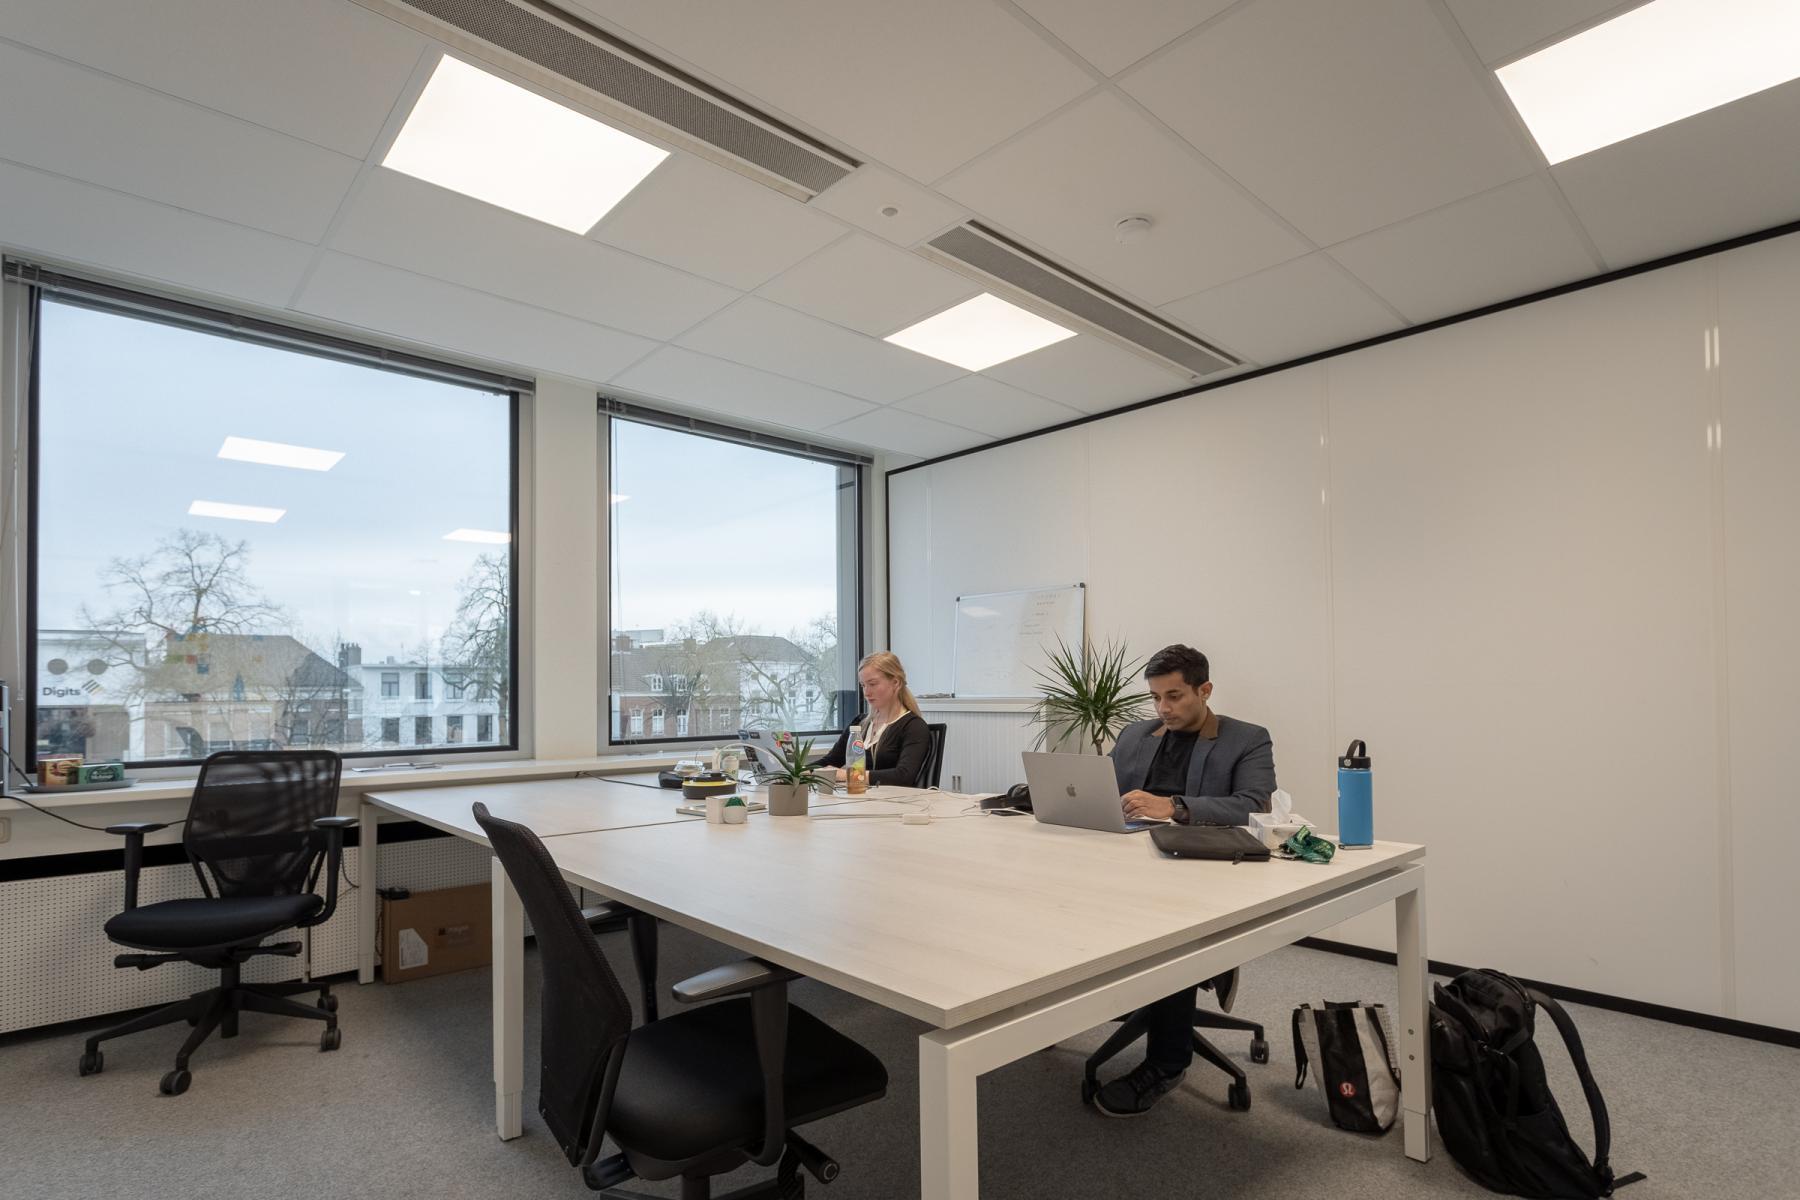 Nette ruime ingerichte kantoorruimte Arnhem